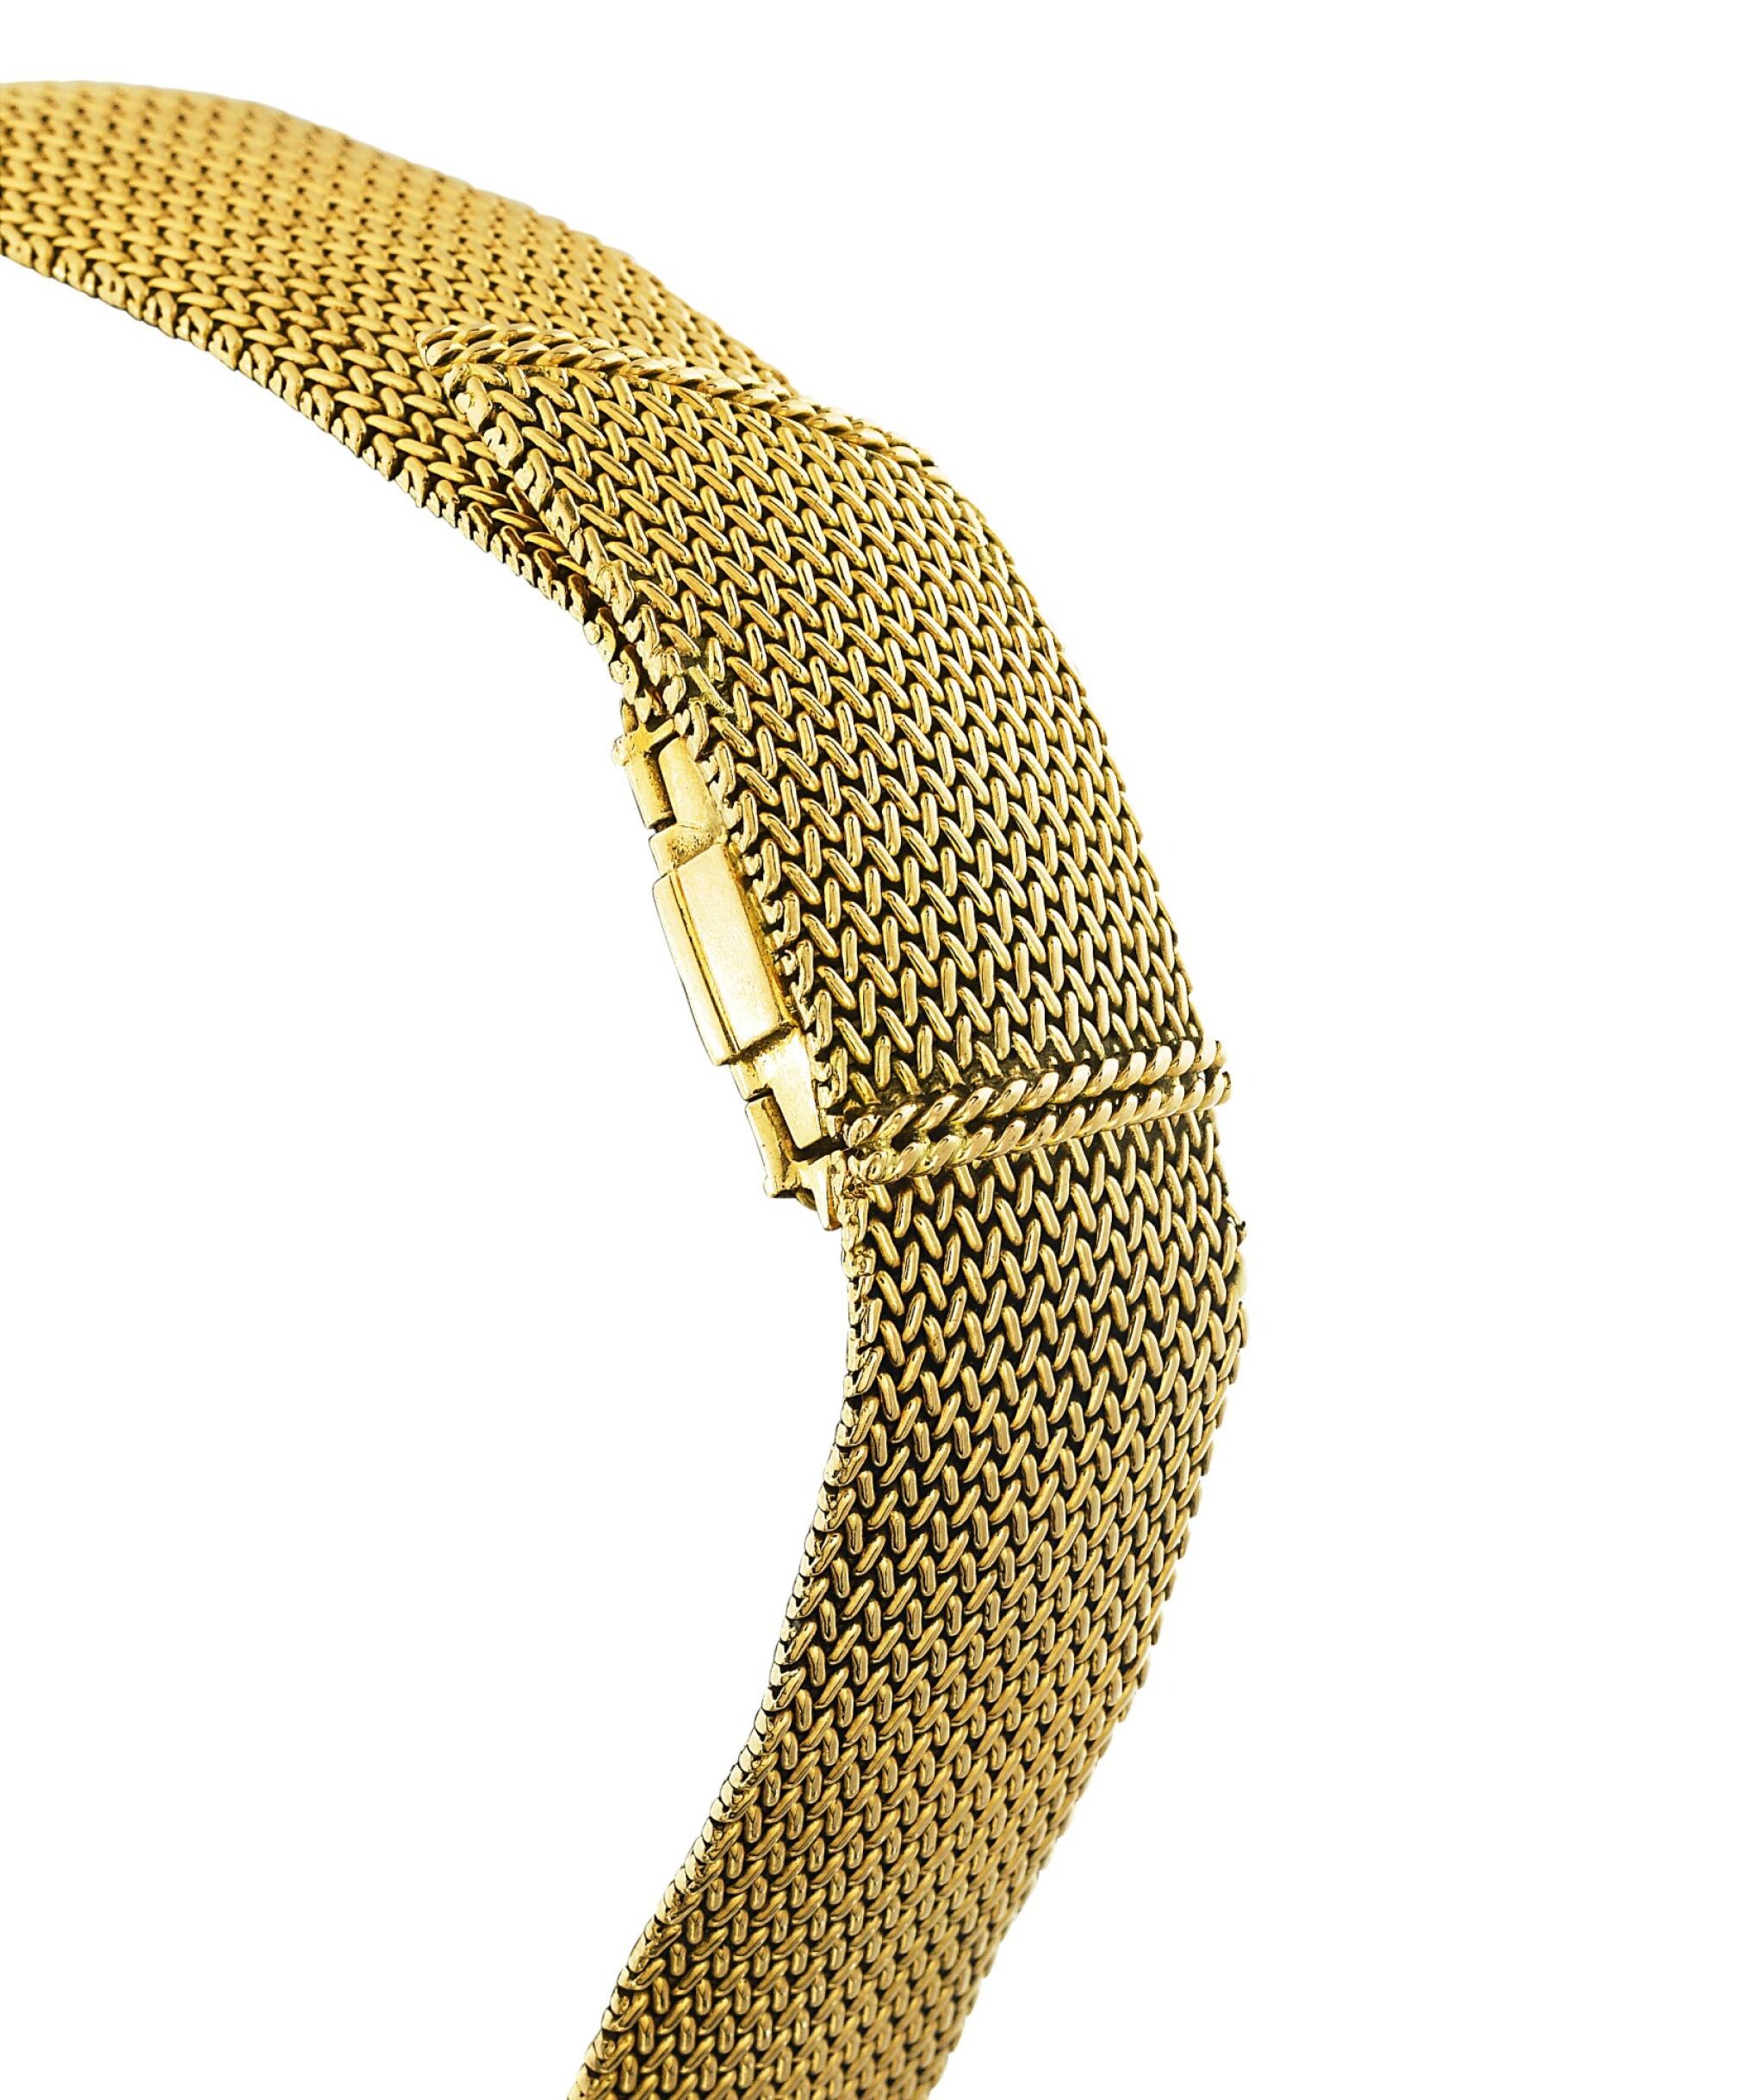 View full screen - View 1 of Lot 68. Montre bracelet de dame or | Gold lady's bracelet watch.